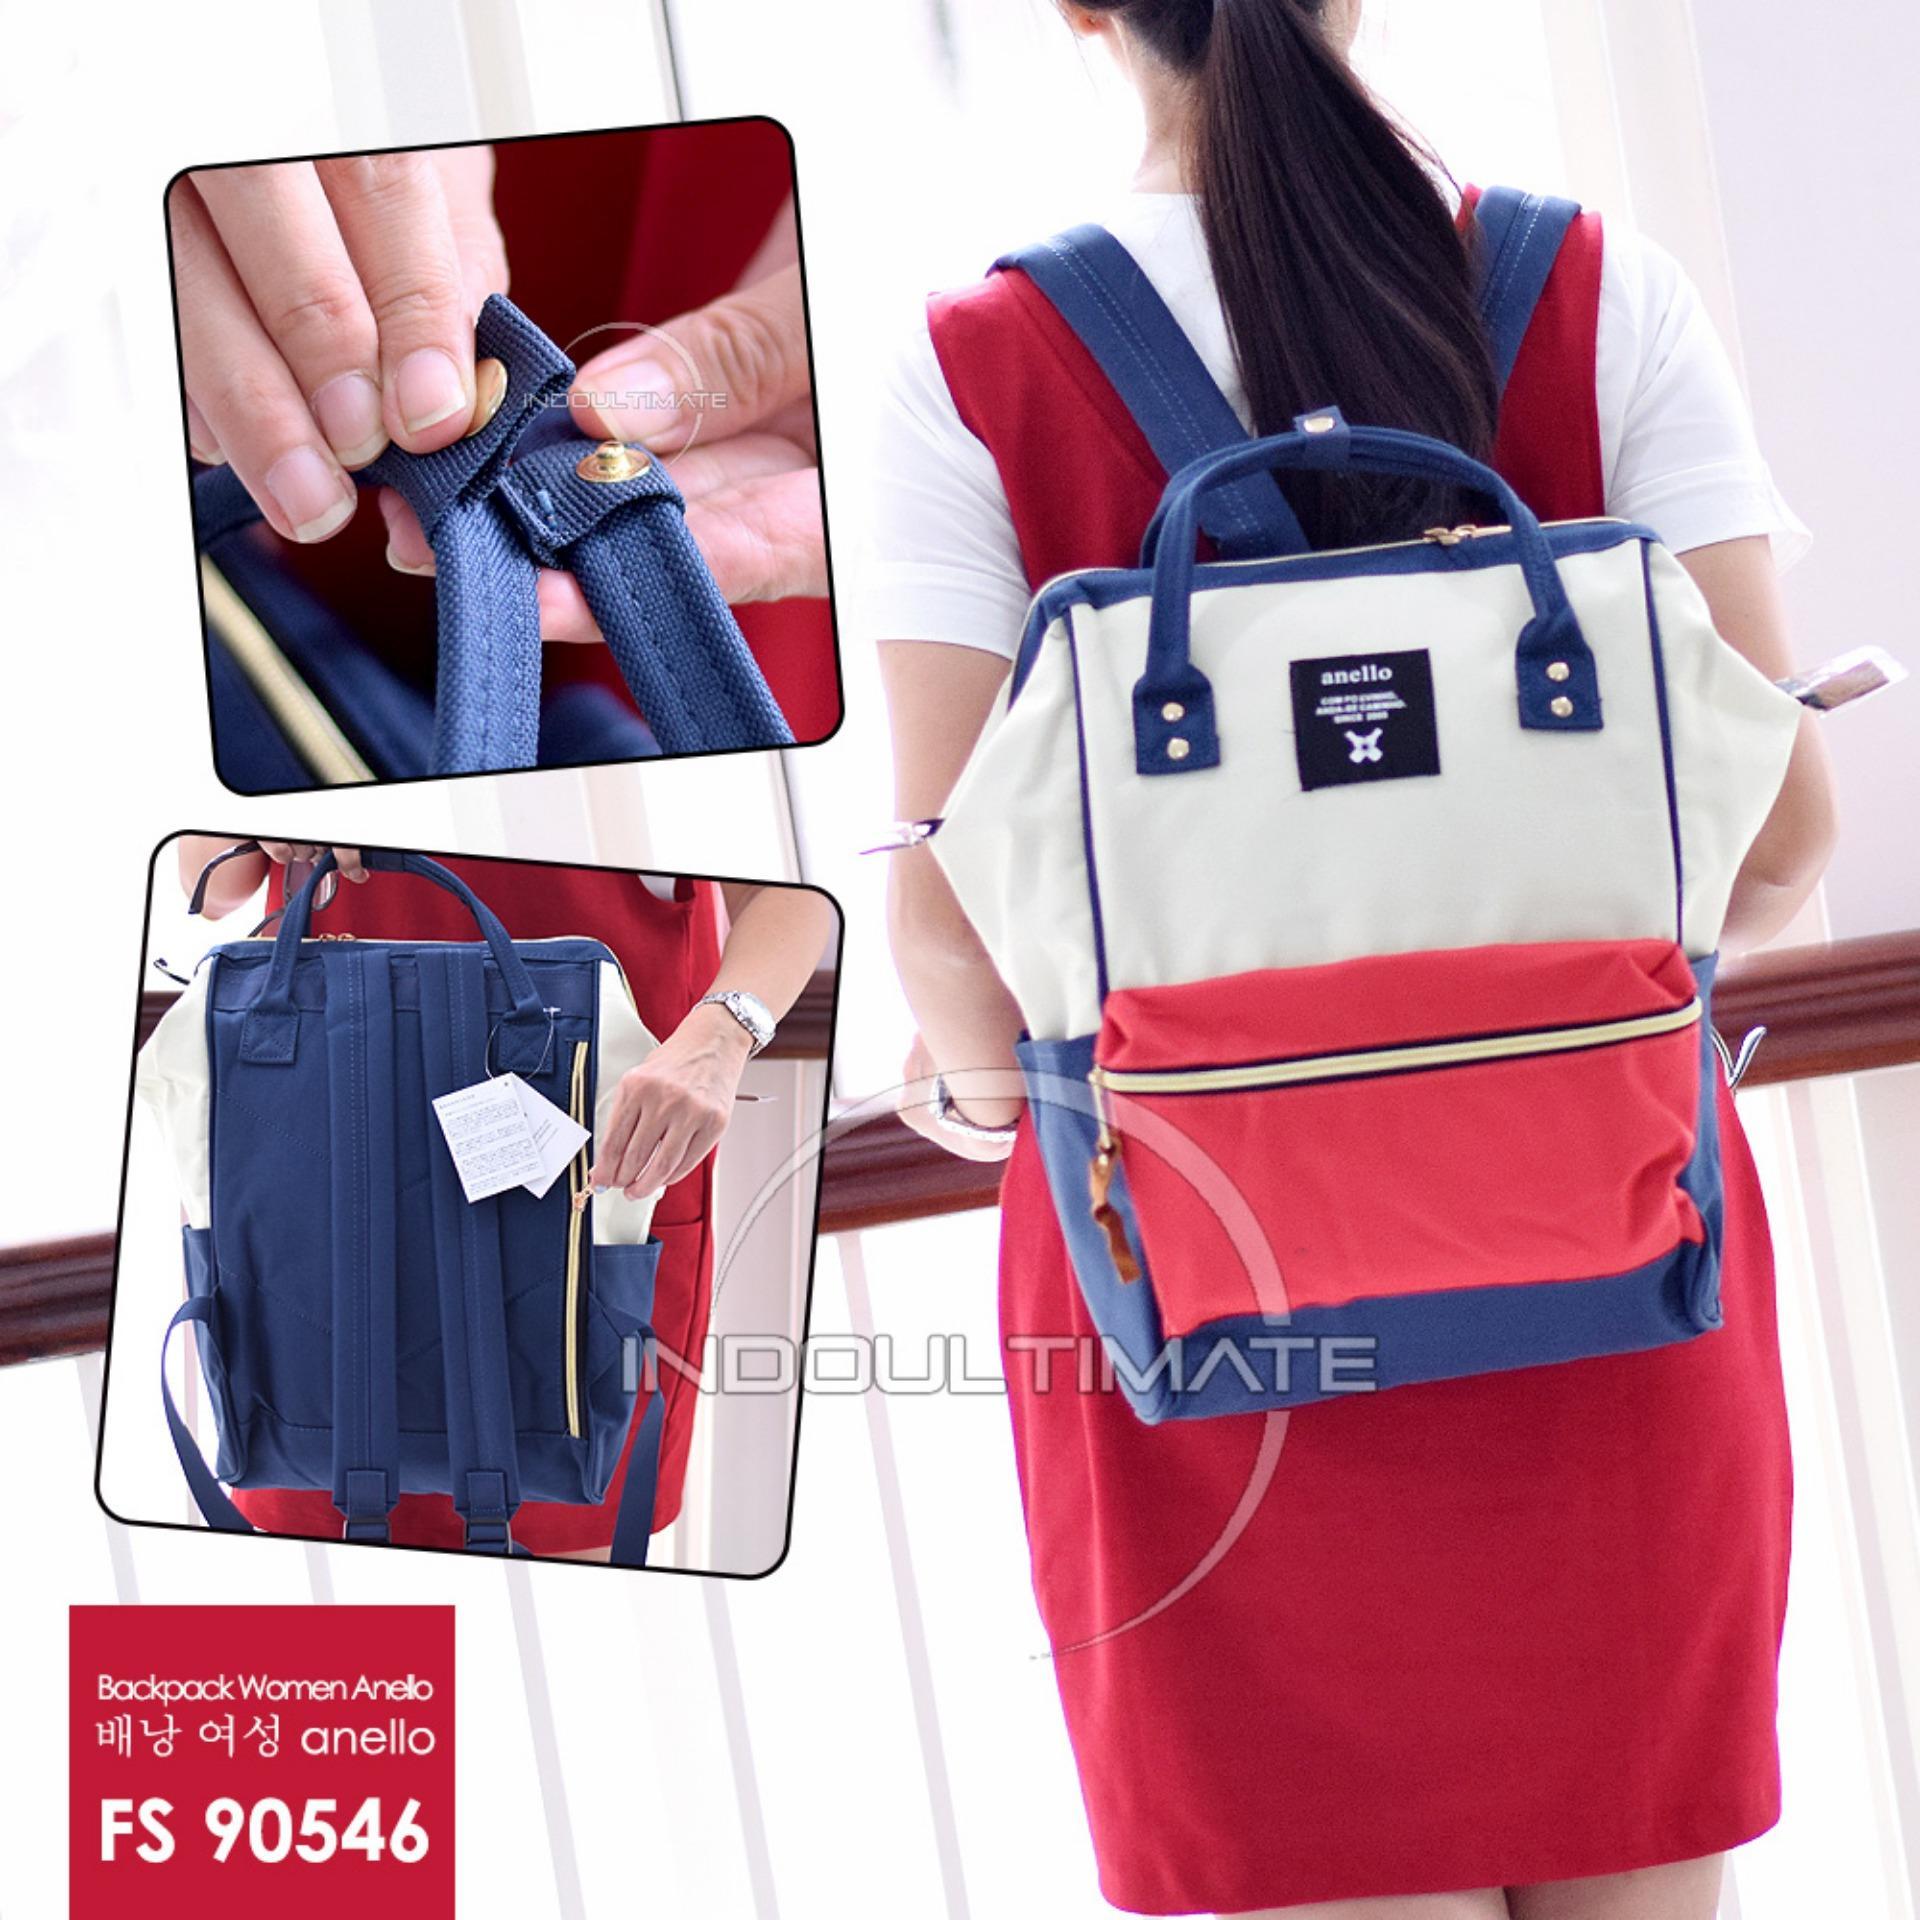 Tips Beli Ultimate Tas Ransel Wanita Fs 90546 Red White Blue Tas 2In1 Cewek Backpack Korea Import Batam Murah Branded Cantik Yang Bagus